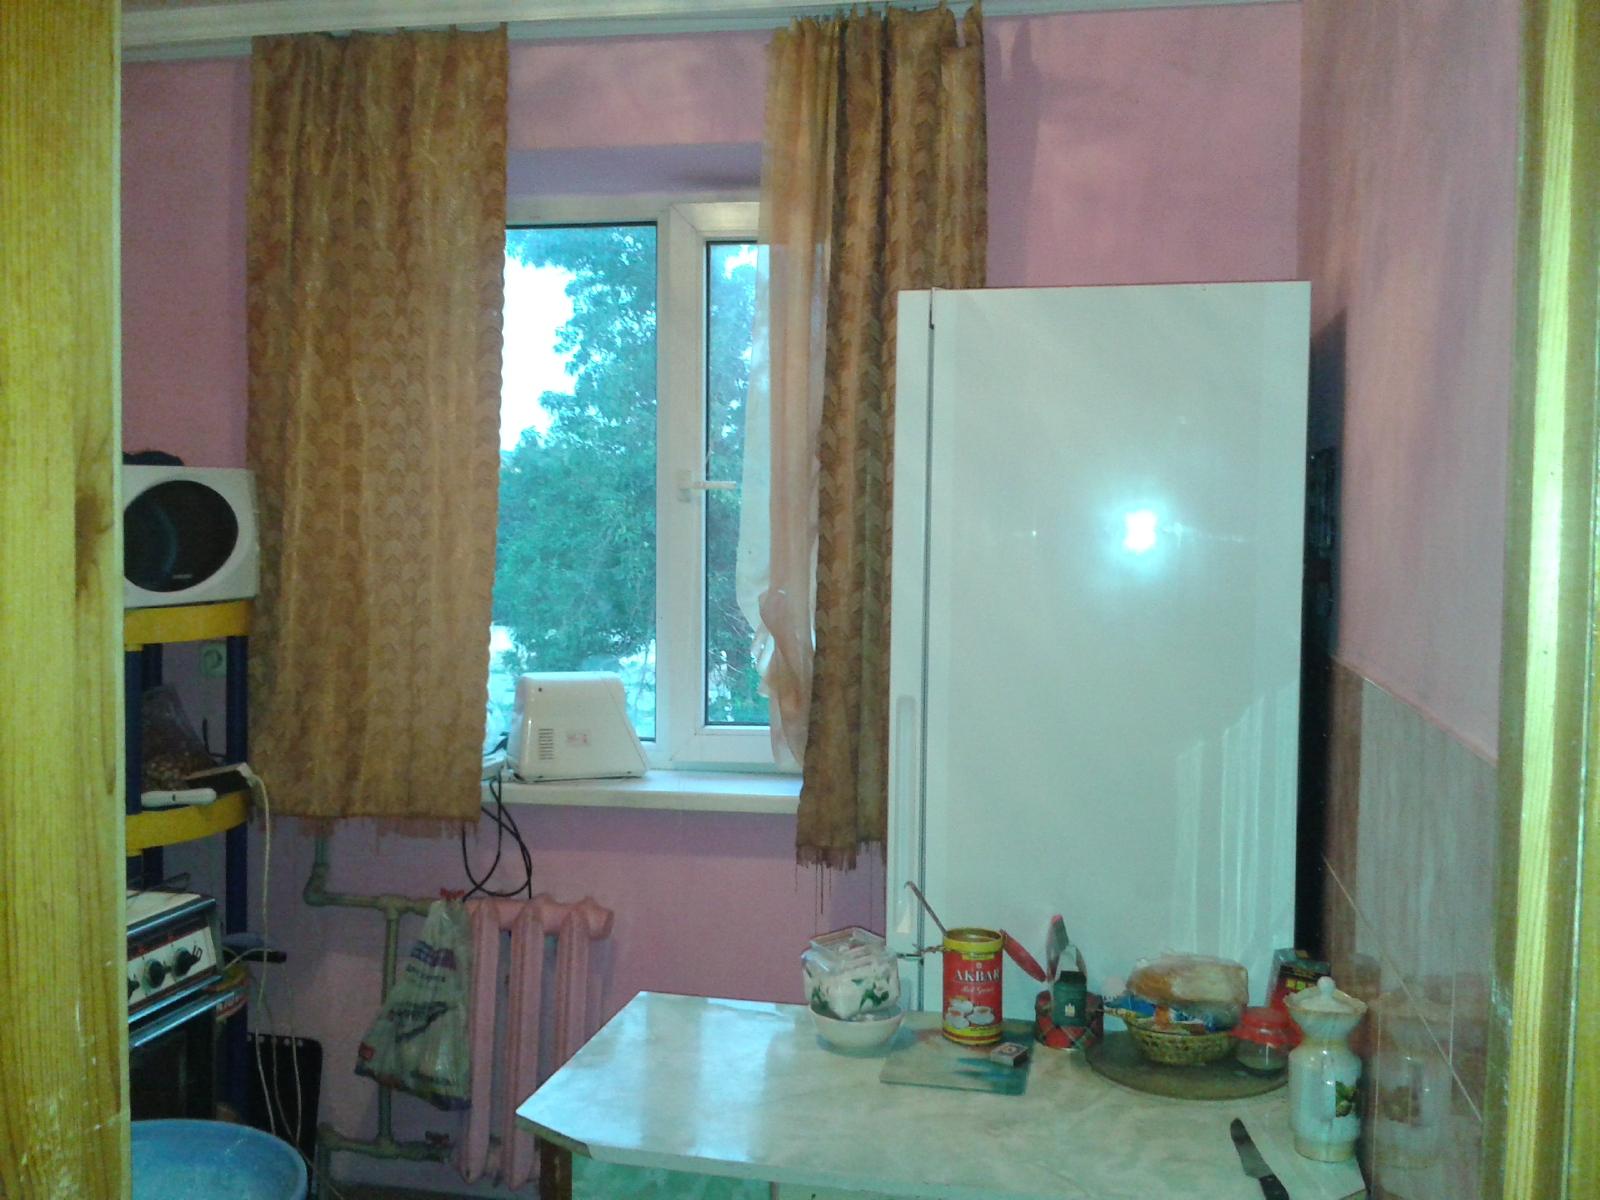 Квартира 3 комнатная в Майкоп район Центр Кавказ